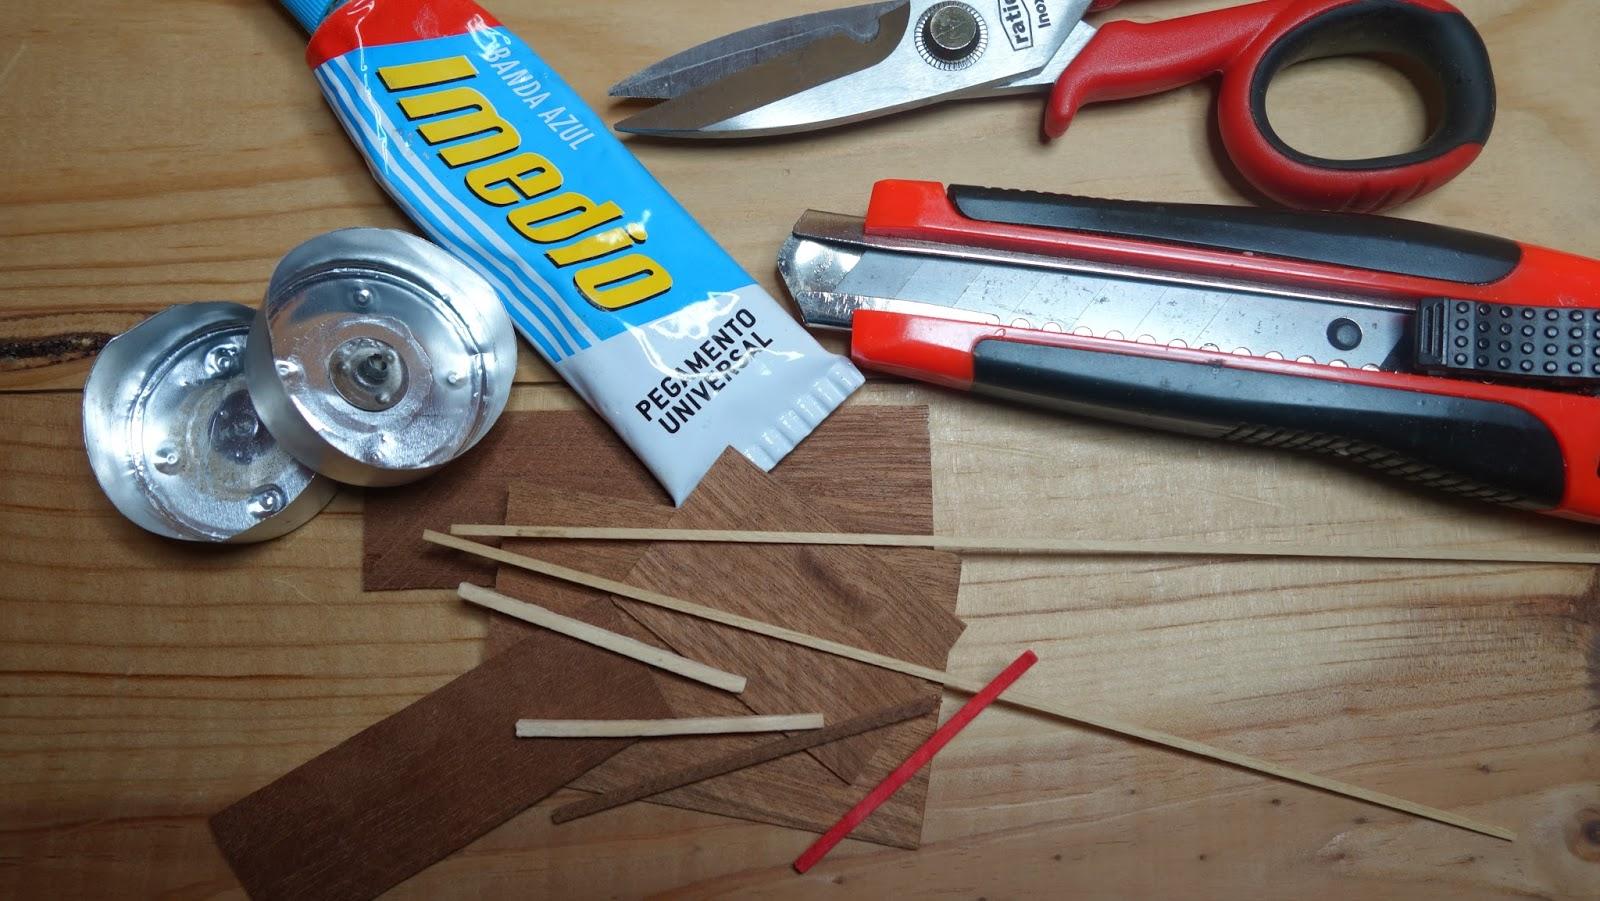 Peque as cosas xil fono de juguete - Listones de aluminio ...